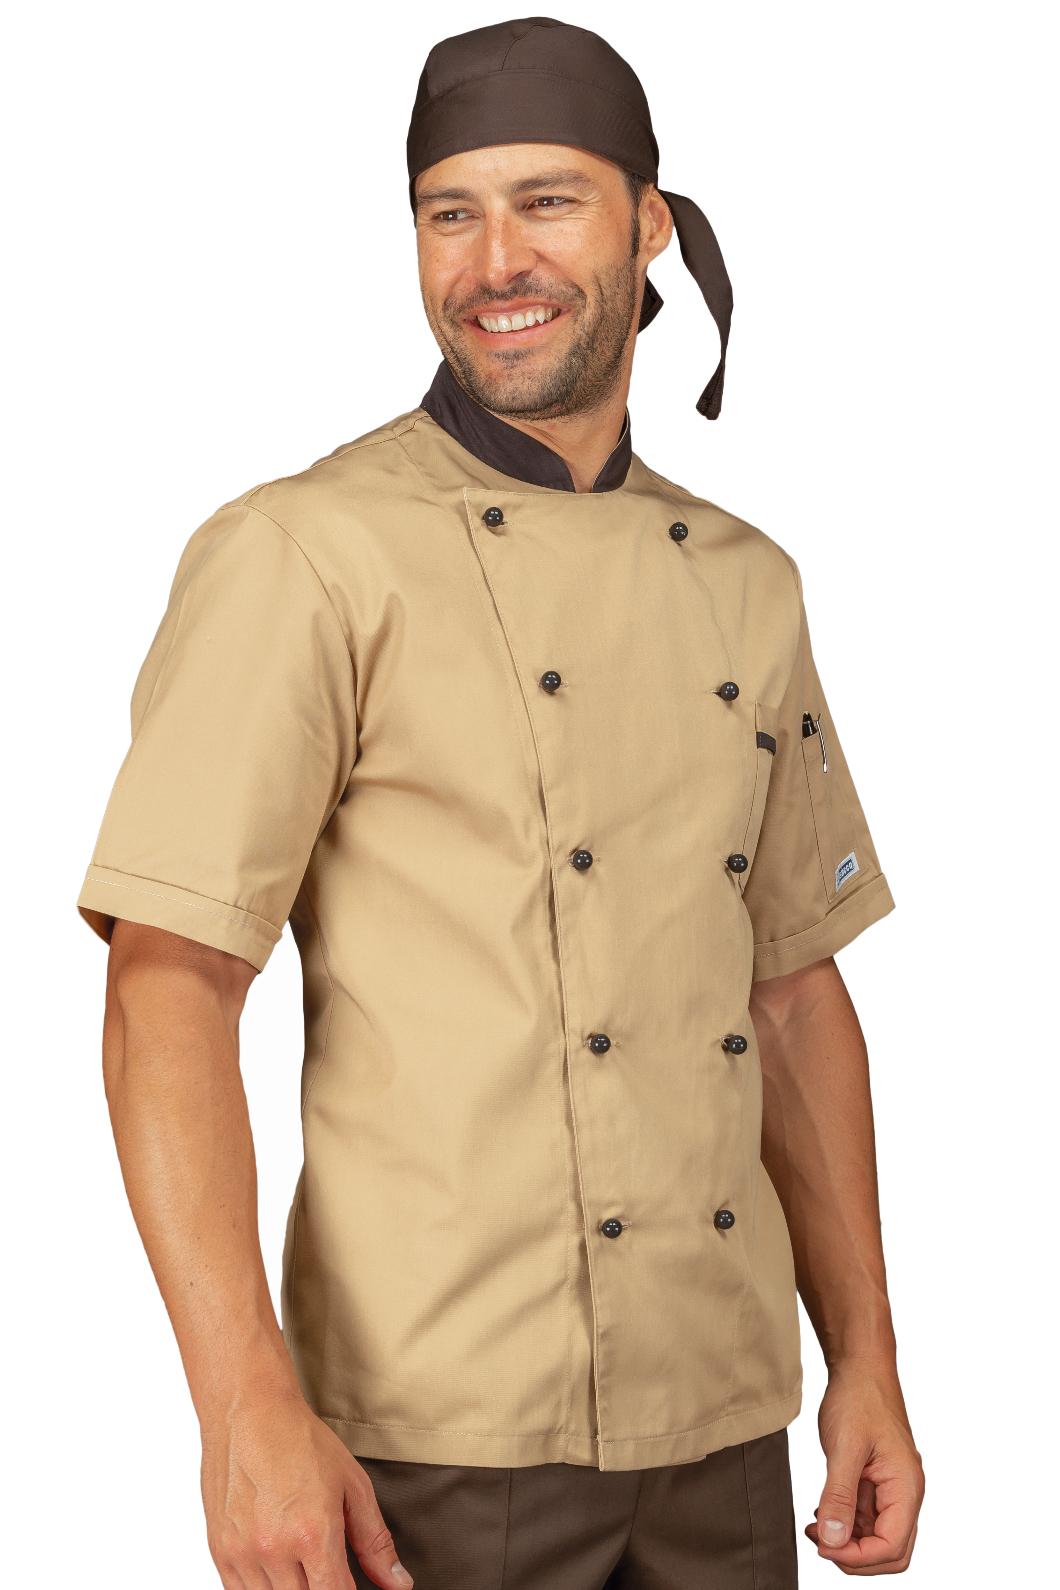 Isacco Giacca Cuoco Bicolore Isacco Biscotto+Testa di Moro Biscotto+Testa di Moro 65/% Poliestere 35/% Cotone M Manica Lunga